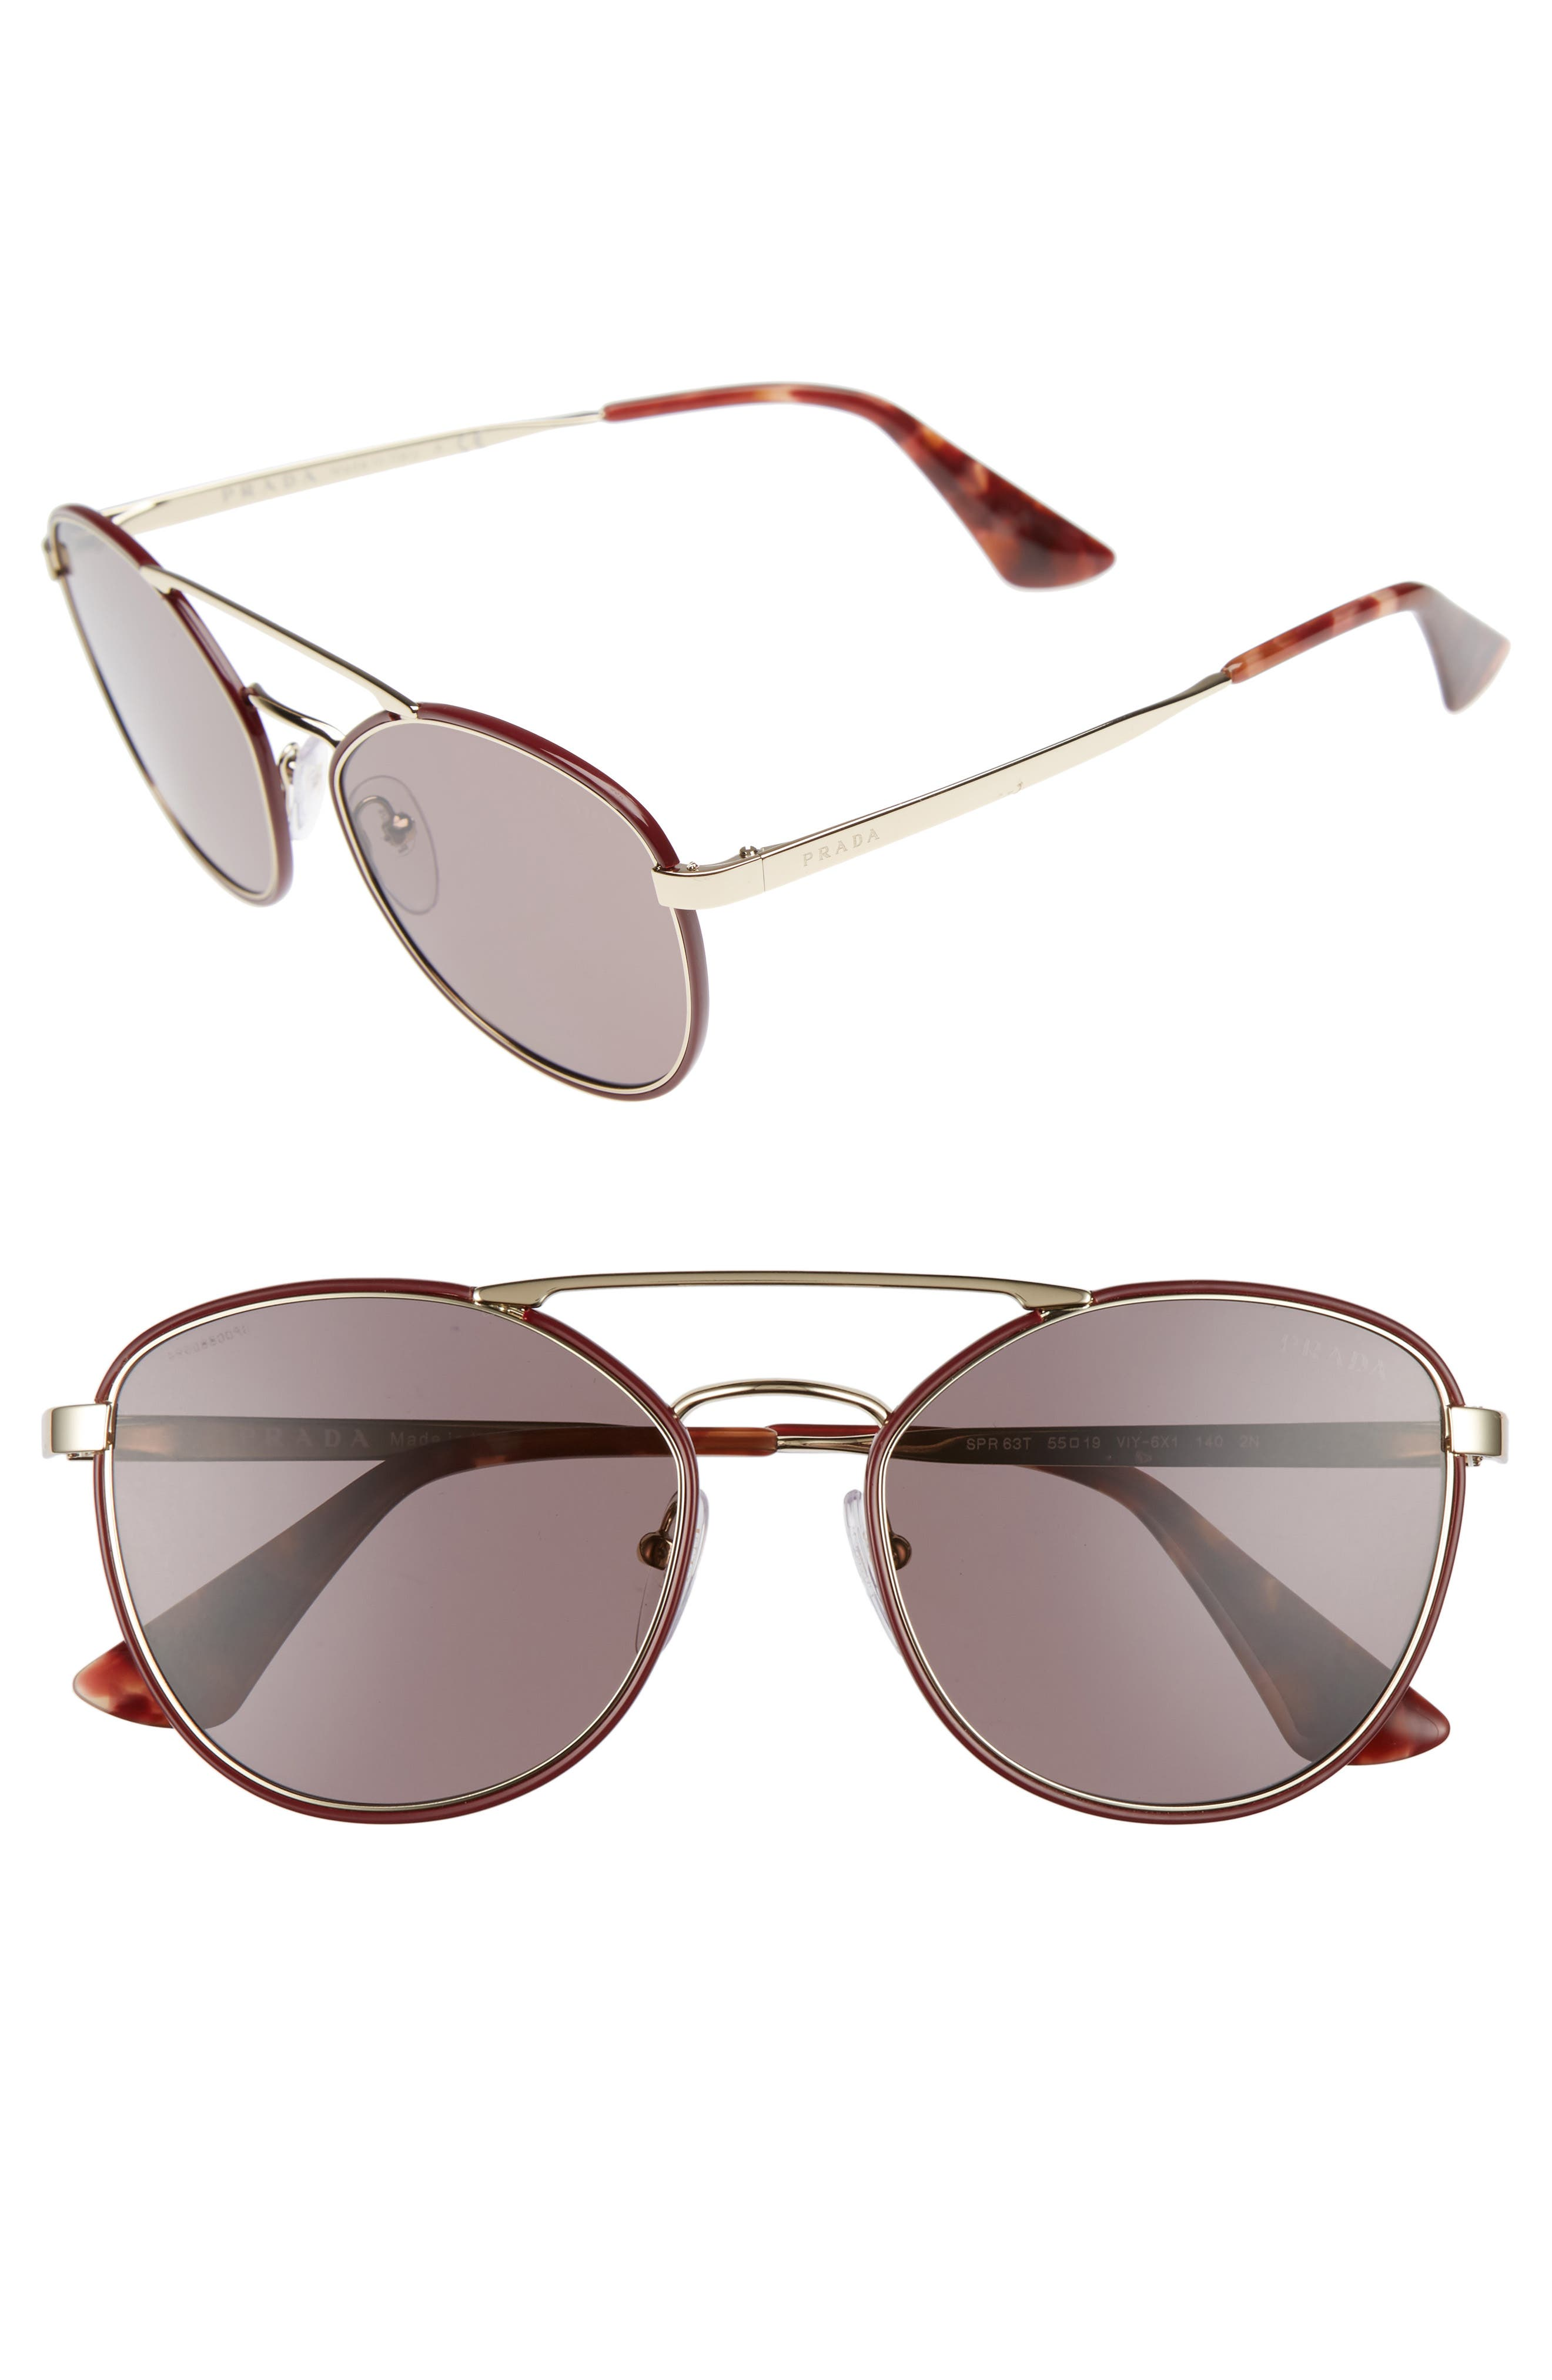 Prada 55mm Metal Aviator Sunglasses